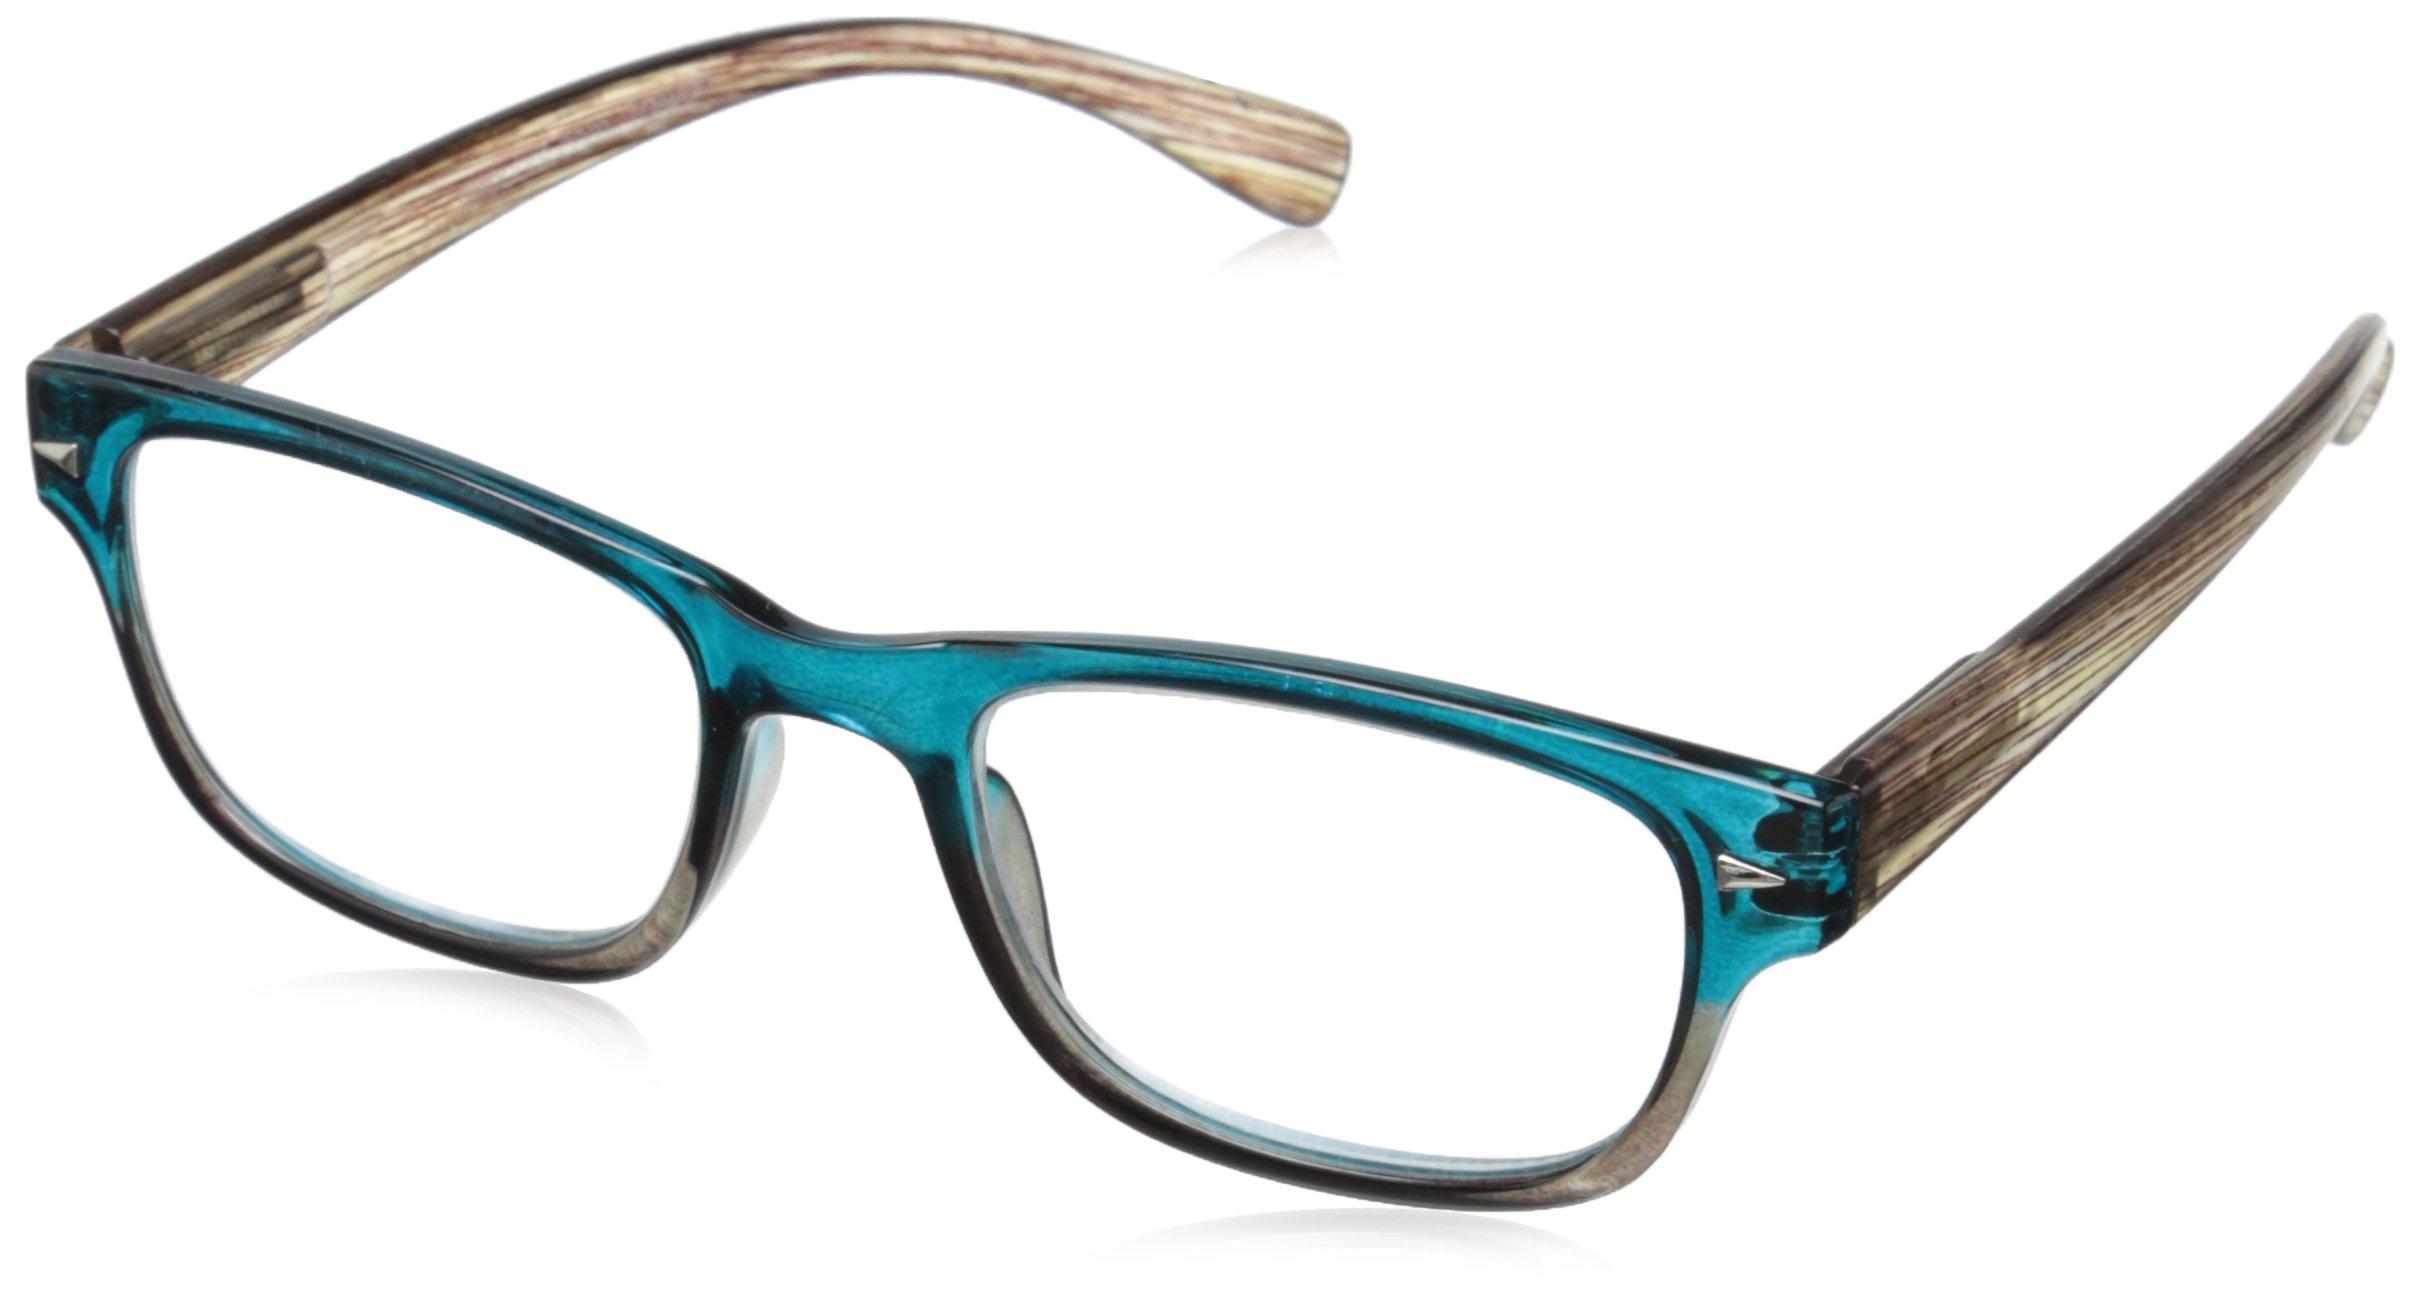 Peepers Aficionado Rectangular Reading Glasses, Blue & Brown, 2.5